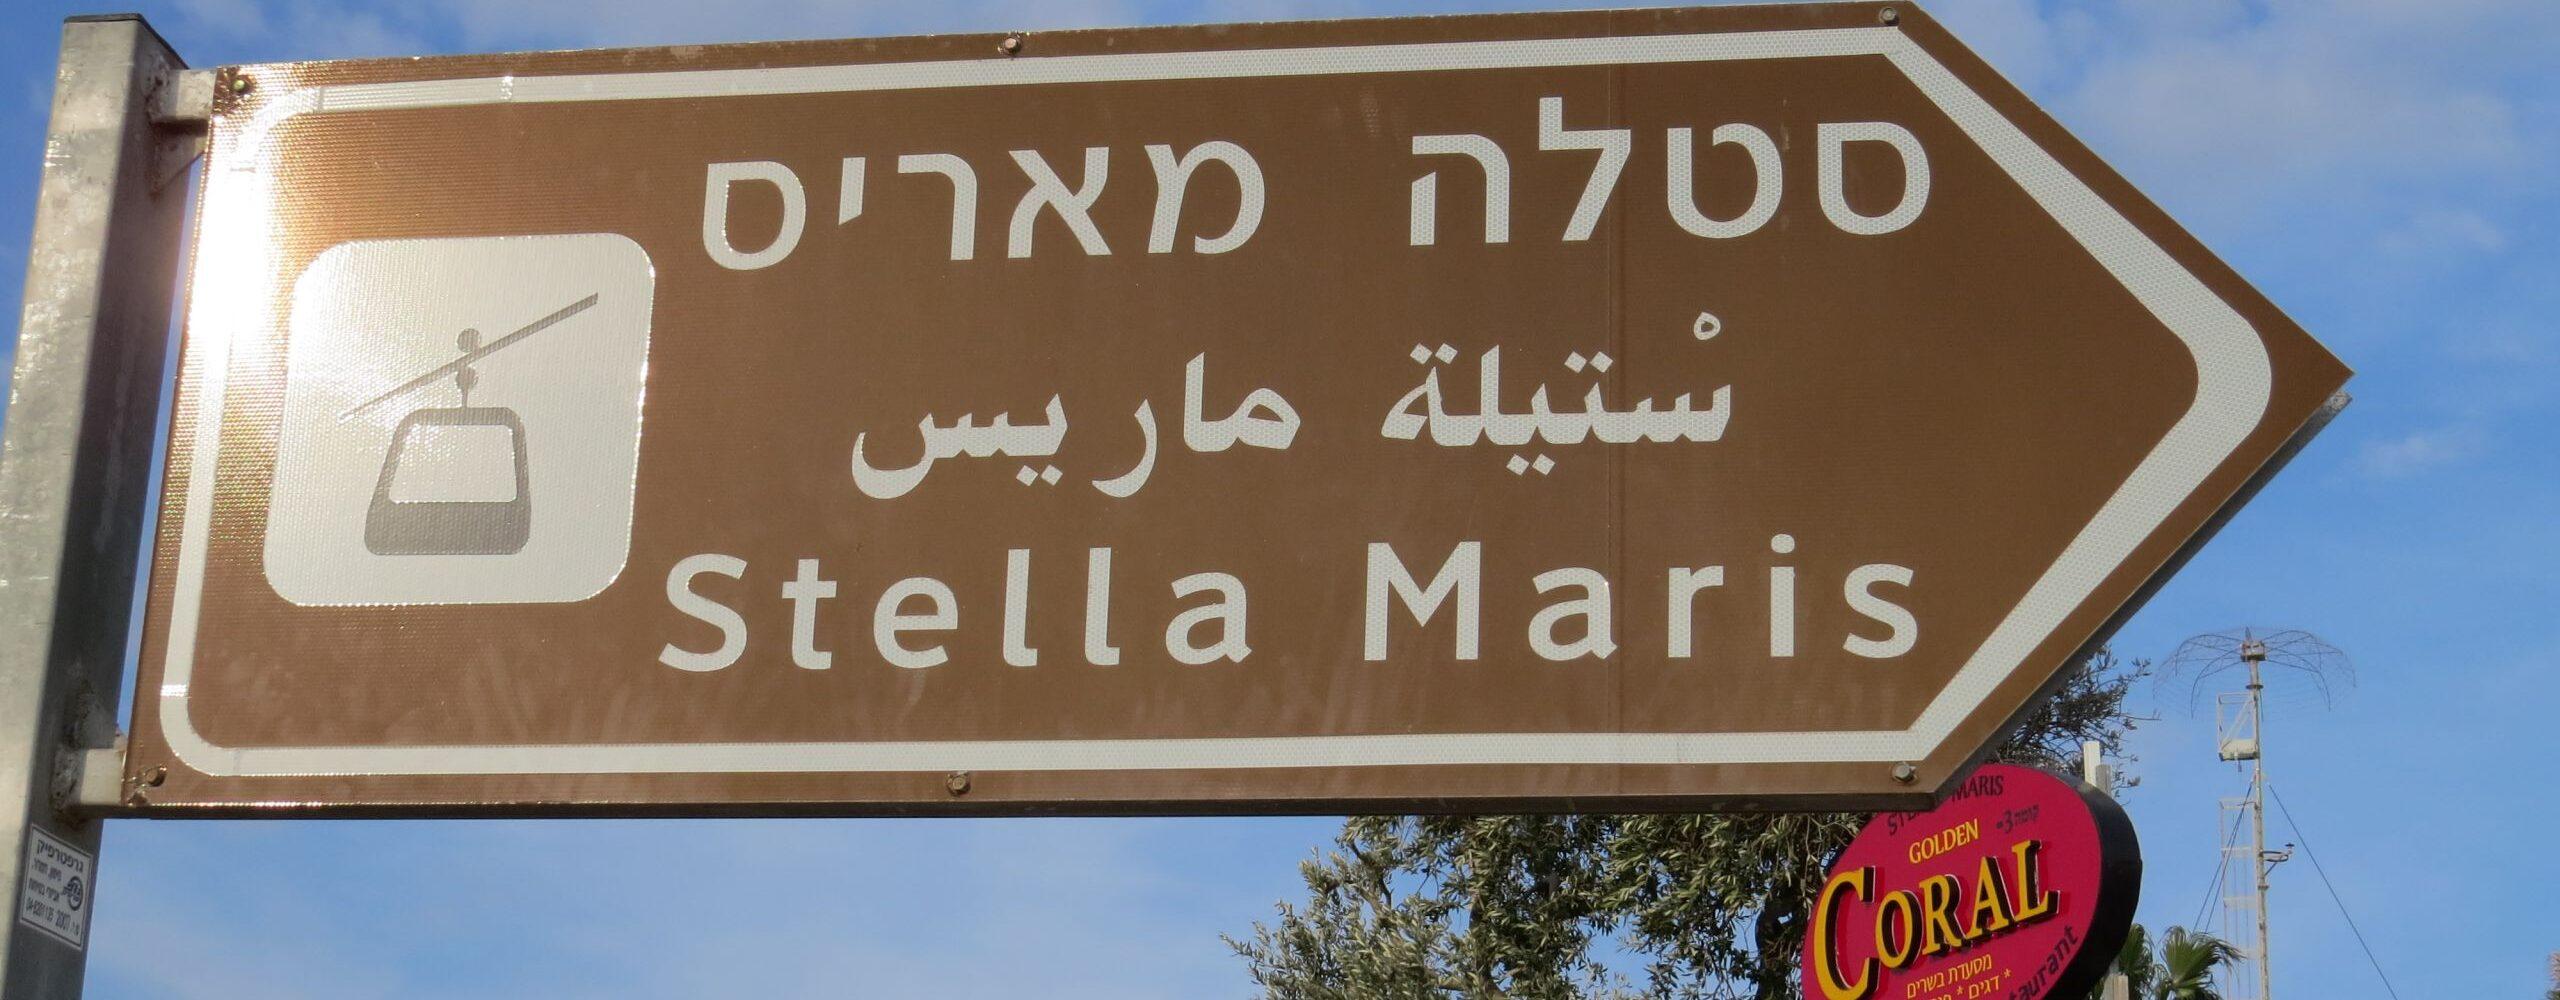 Хайфа, Стелла Марис, море ипорт